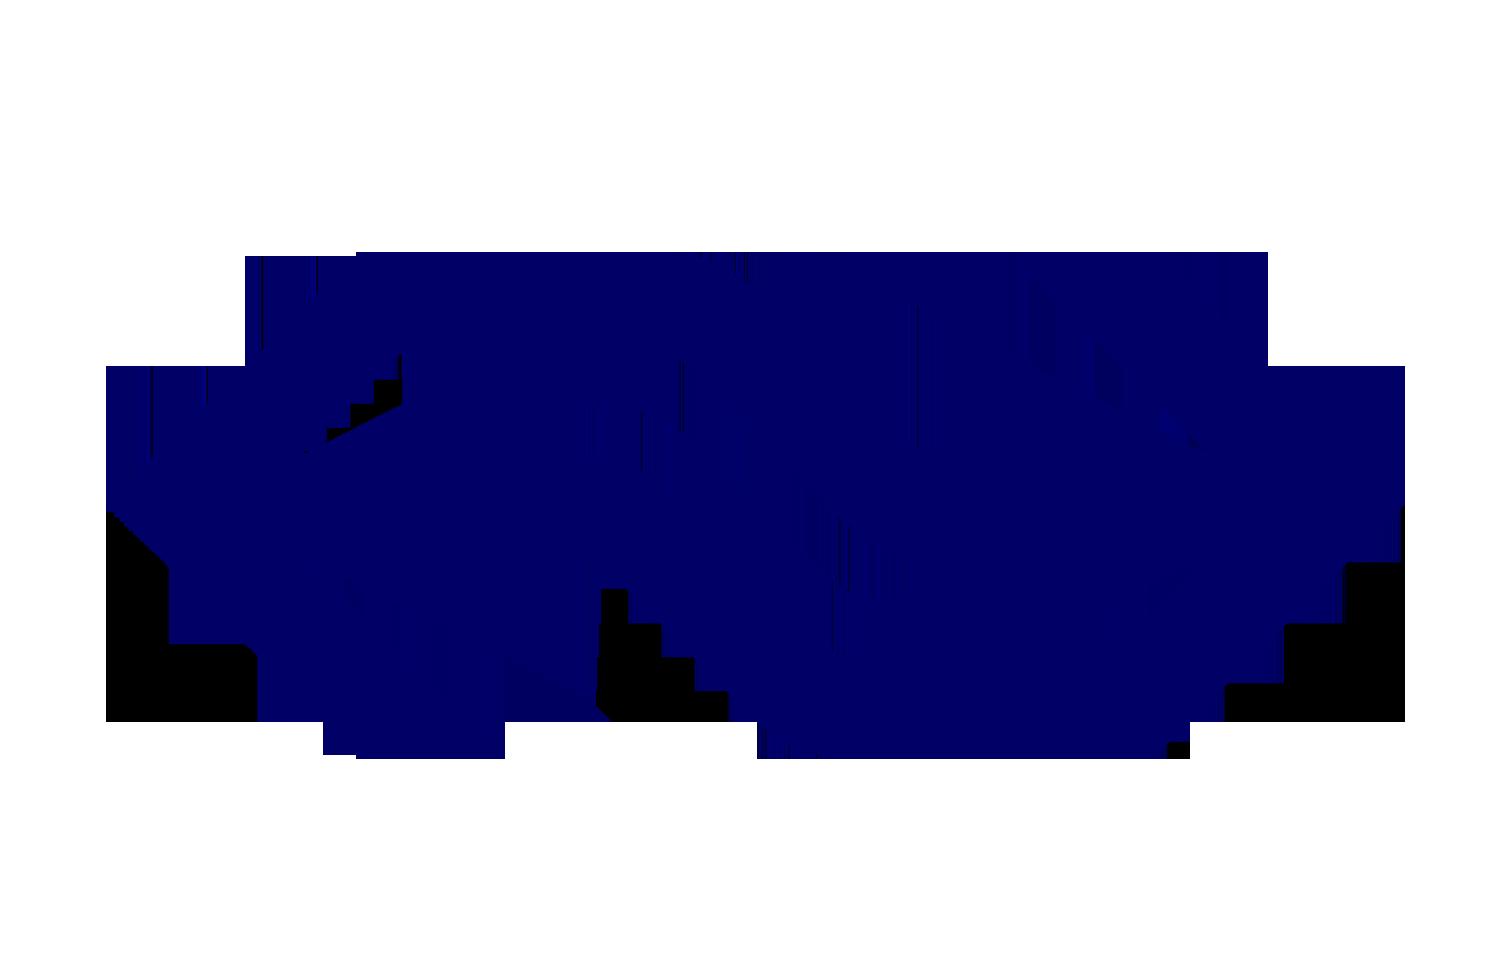 Nederlandse-spoorwegen-NS-logo-1-e1474618823243.png